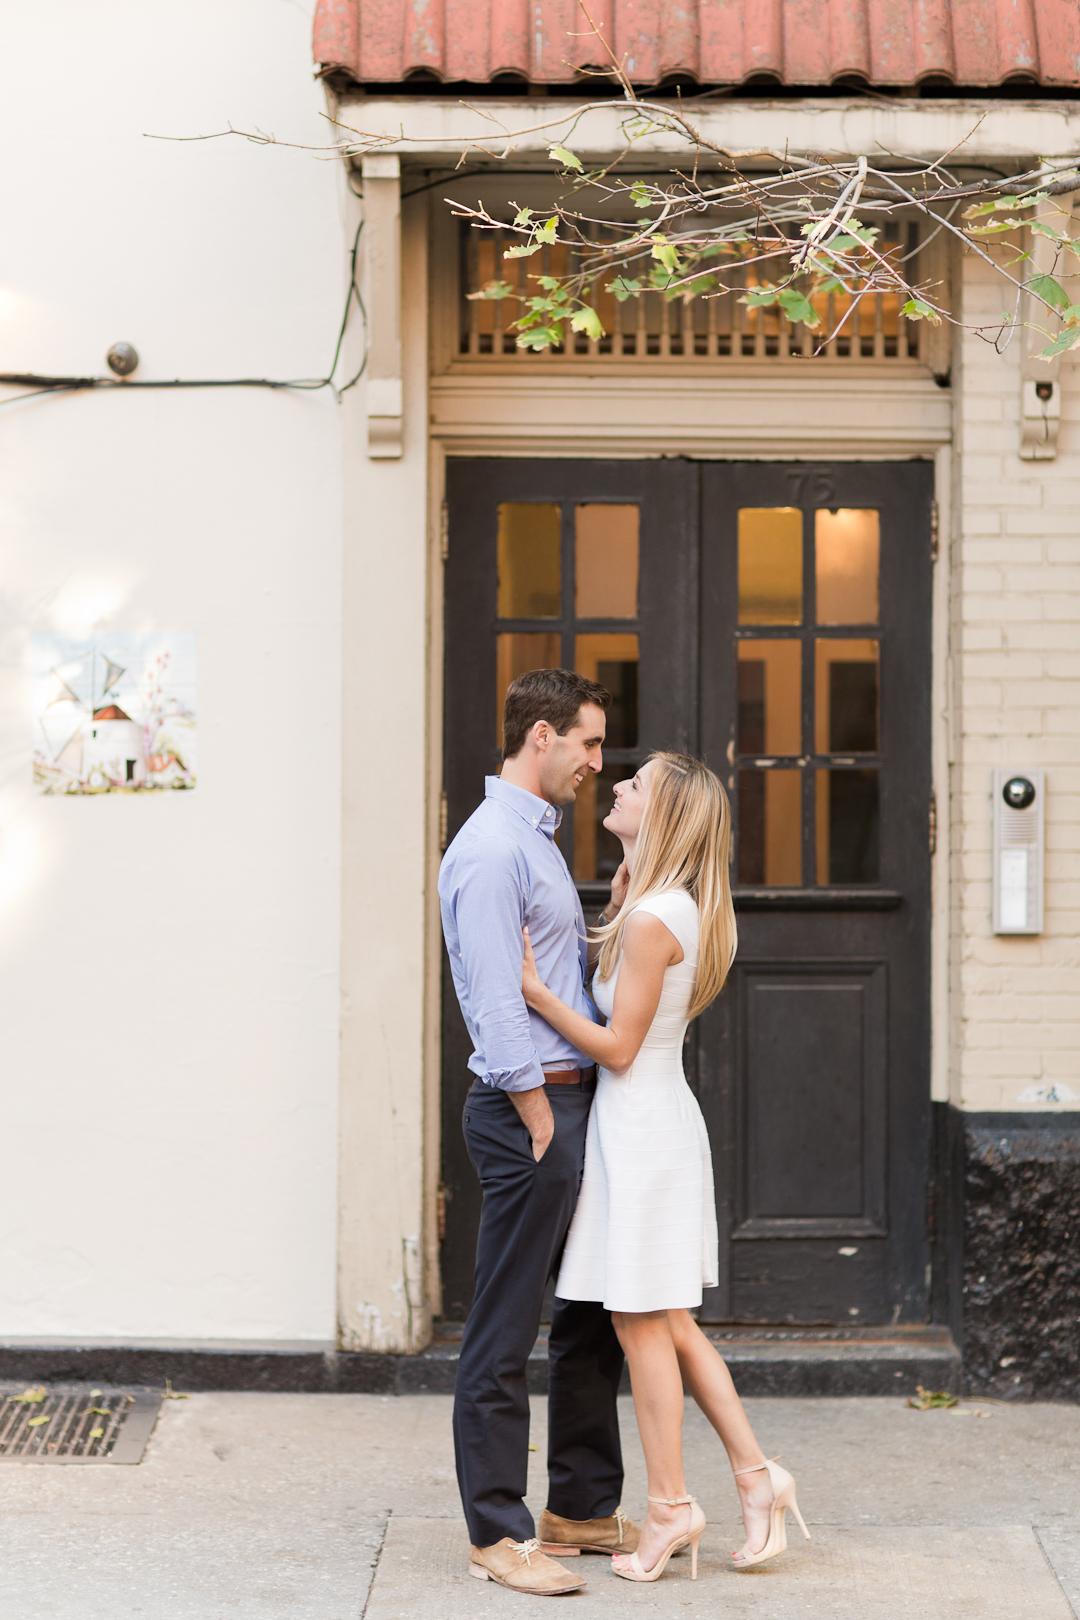 Melissa Kruse Photography - Daniece & Chris West Village Engagement Photos-47.jpg